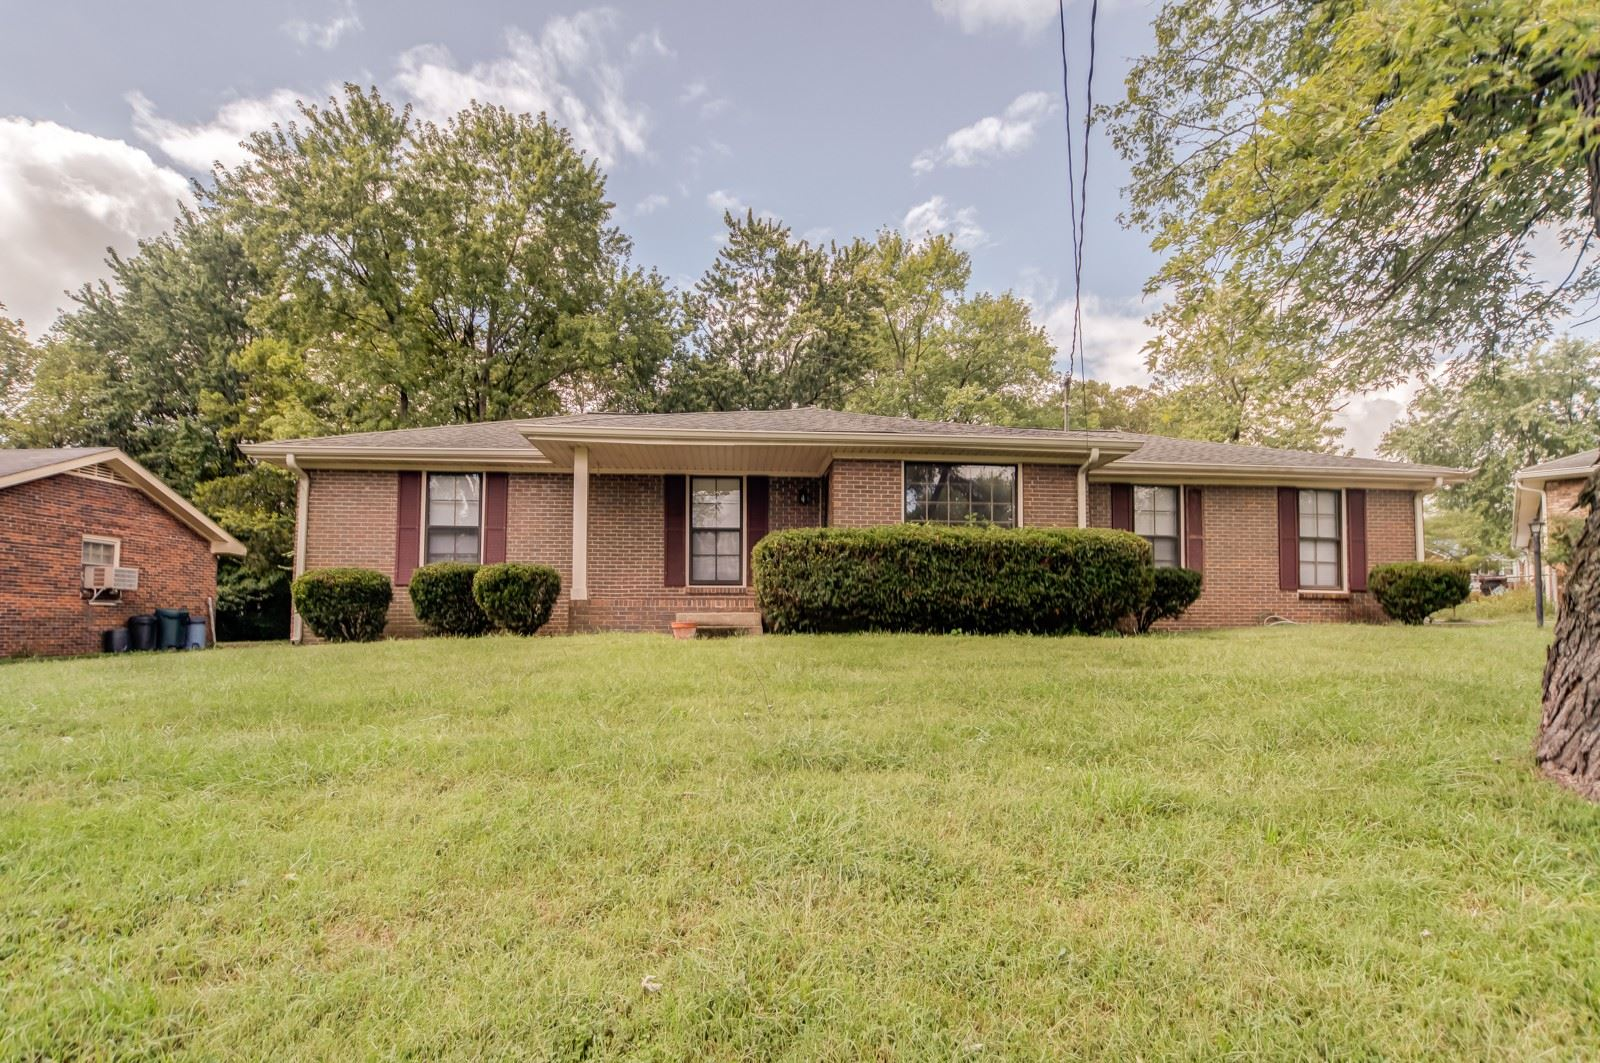 118 Susan Dr, Hendersonville, TN 37075 - MLS#: 2294126